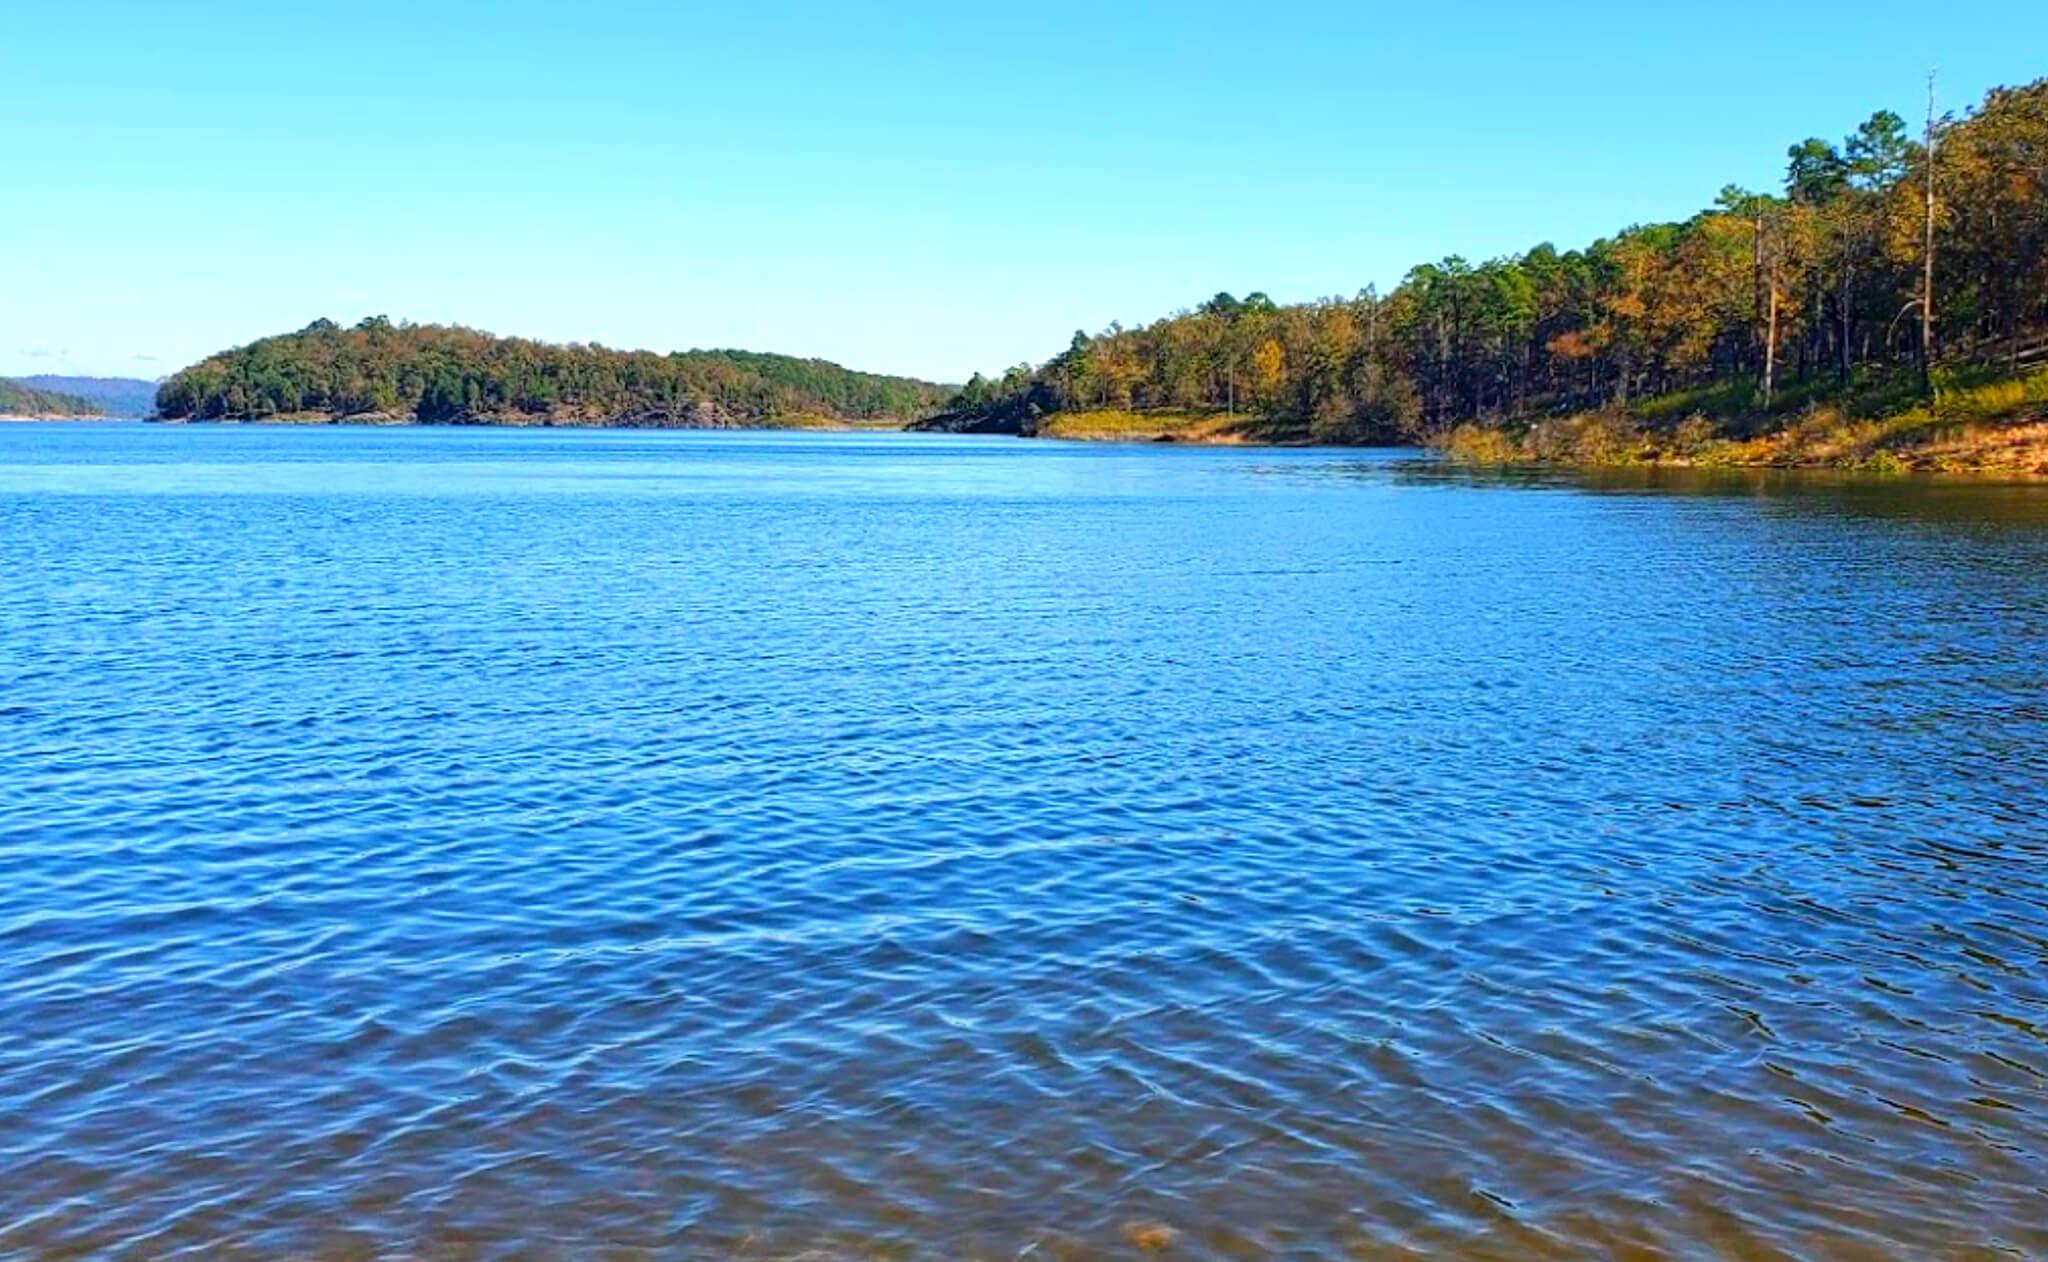 Broken-Bow-Lake-Fishing-Report-Guide-Oklahoma-OK-01